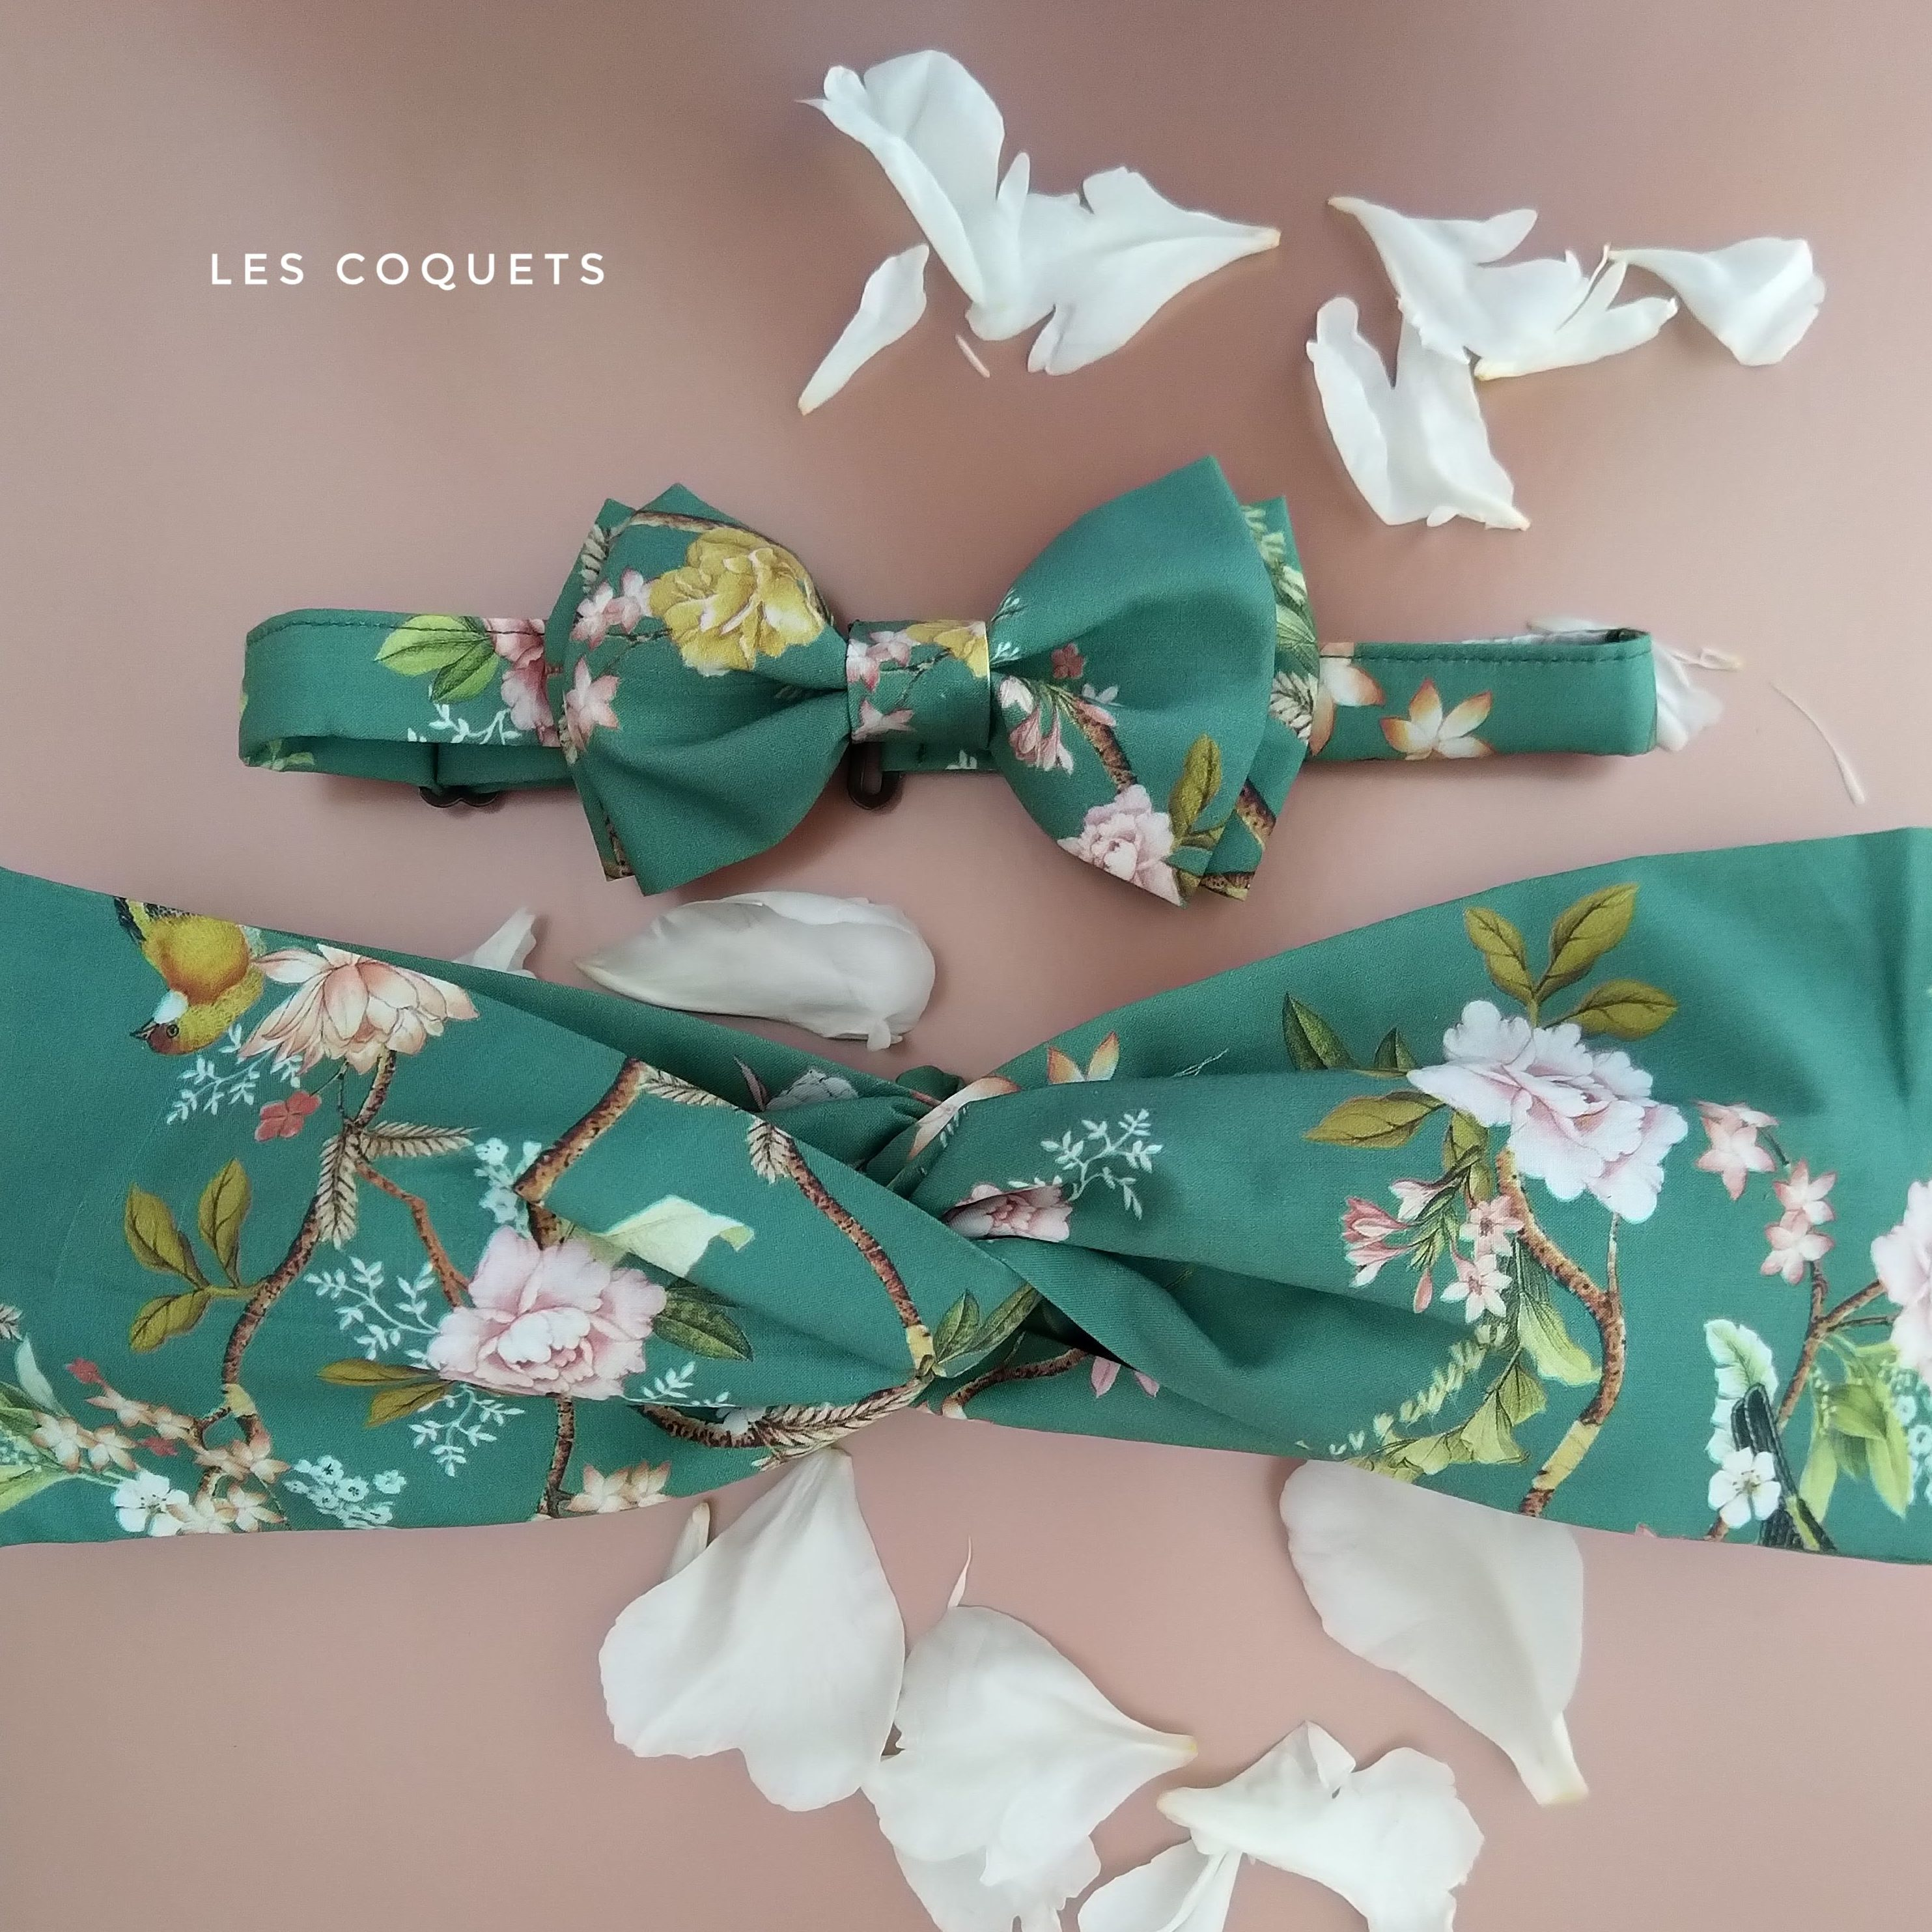 Headband Noeud papillon sur mesure liberty L'Otarie Club Coffret Mariage